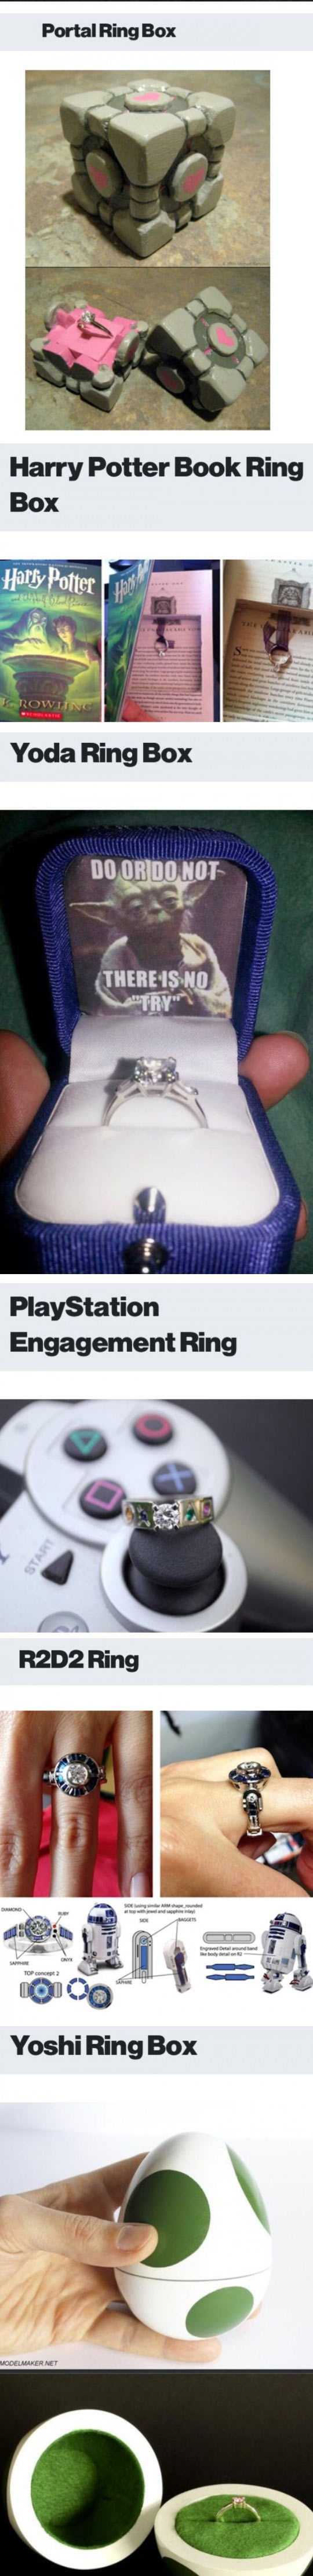 funny-ring-box-propose-Pokemon-Portal